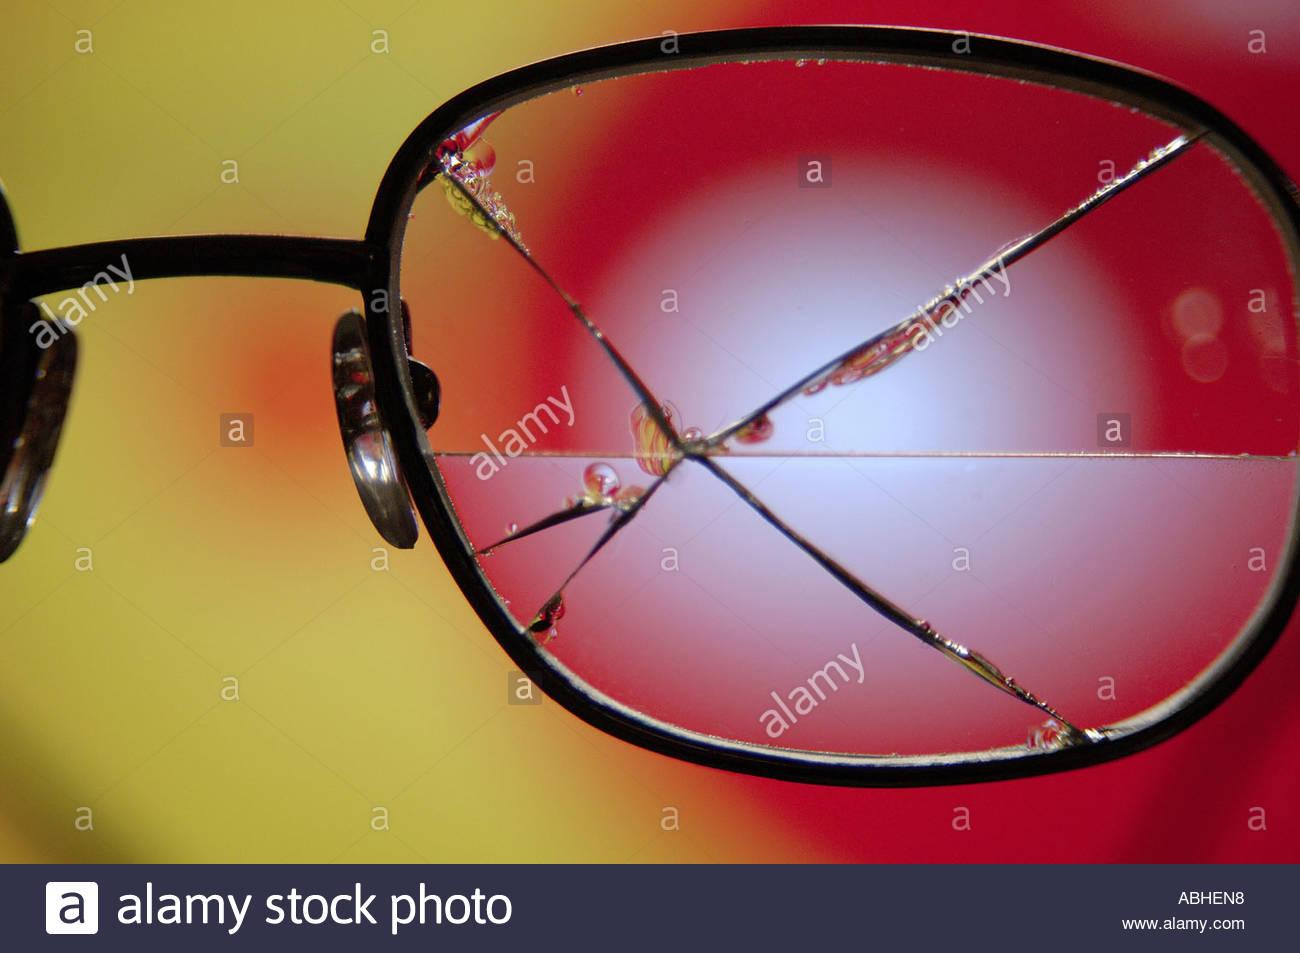 Broken glasses - Stock Image